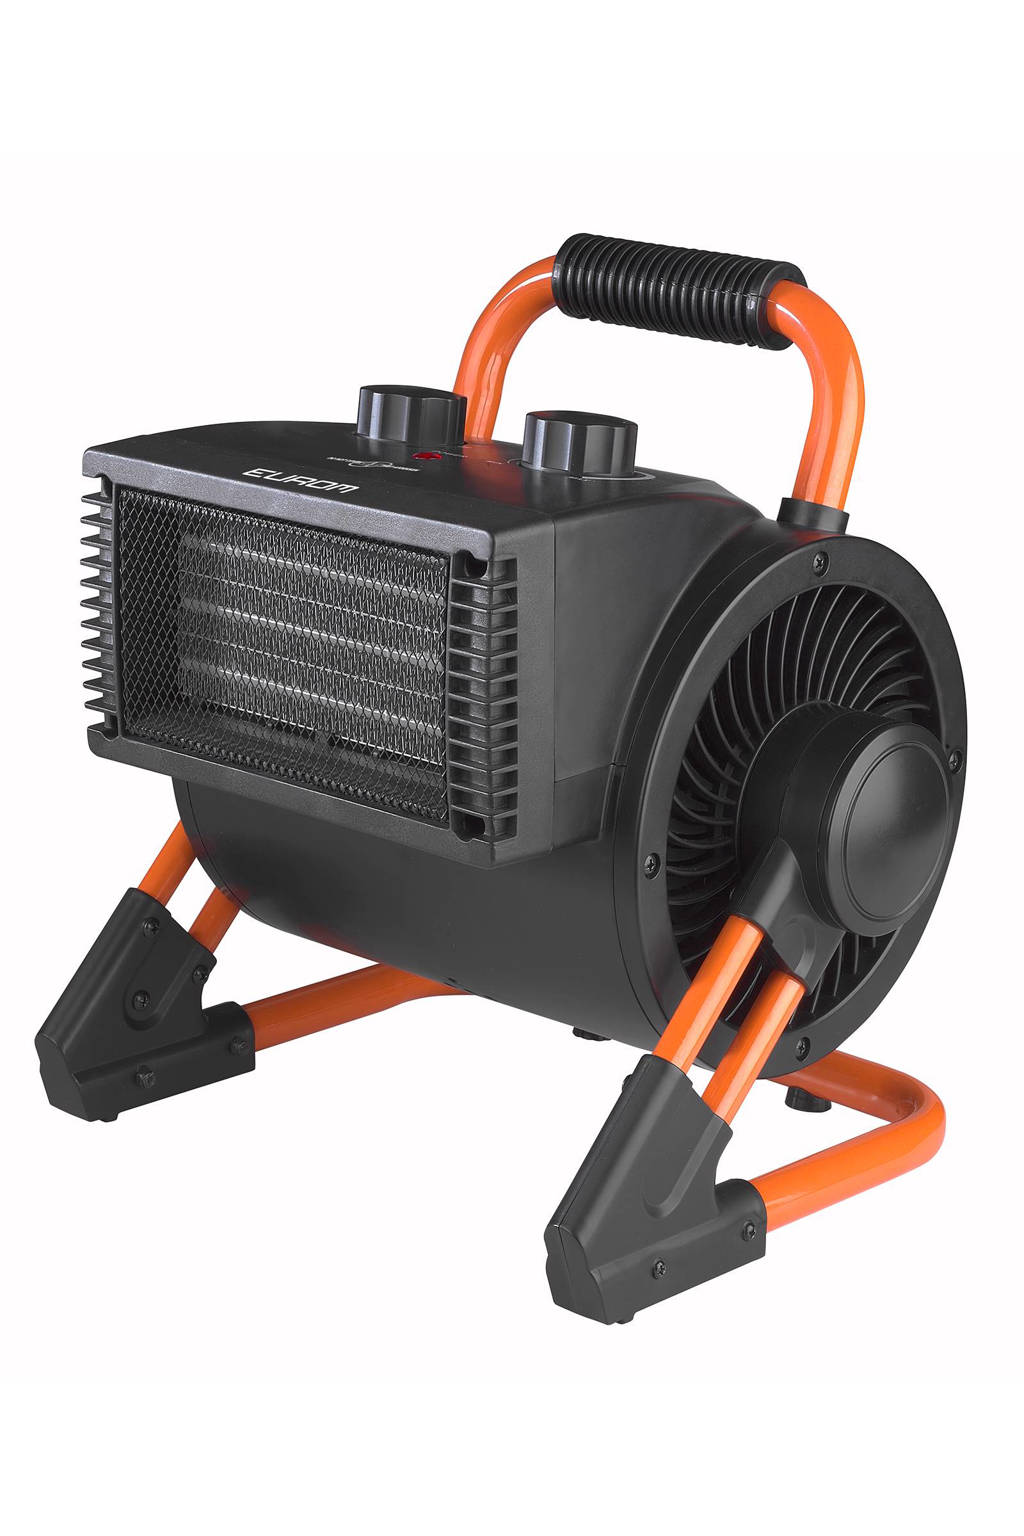 Eurom EK3K Still elektrische werkplaatskachel, 3000